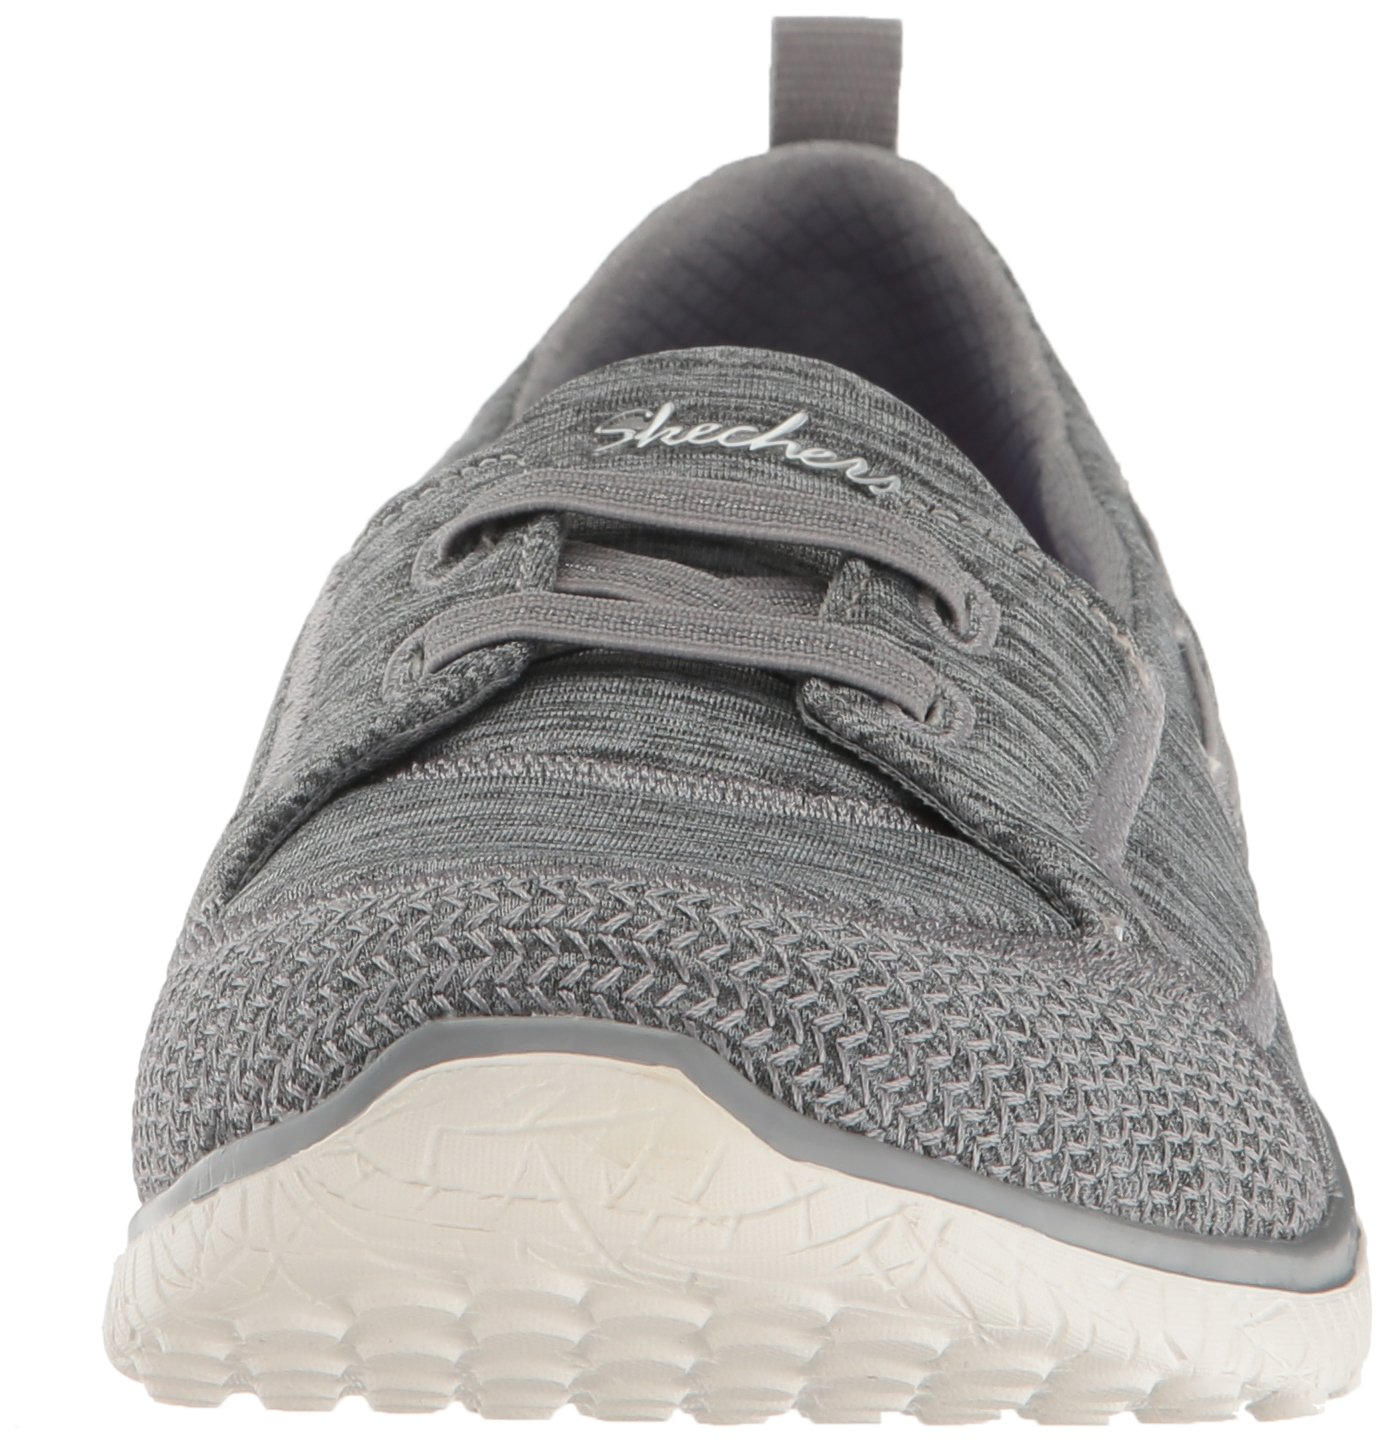 Skechers Microburst-Topnotch amazon-shoes blu-marino Venta Caliente Barato Costo Sast Salida Mbsez